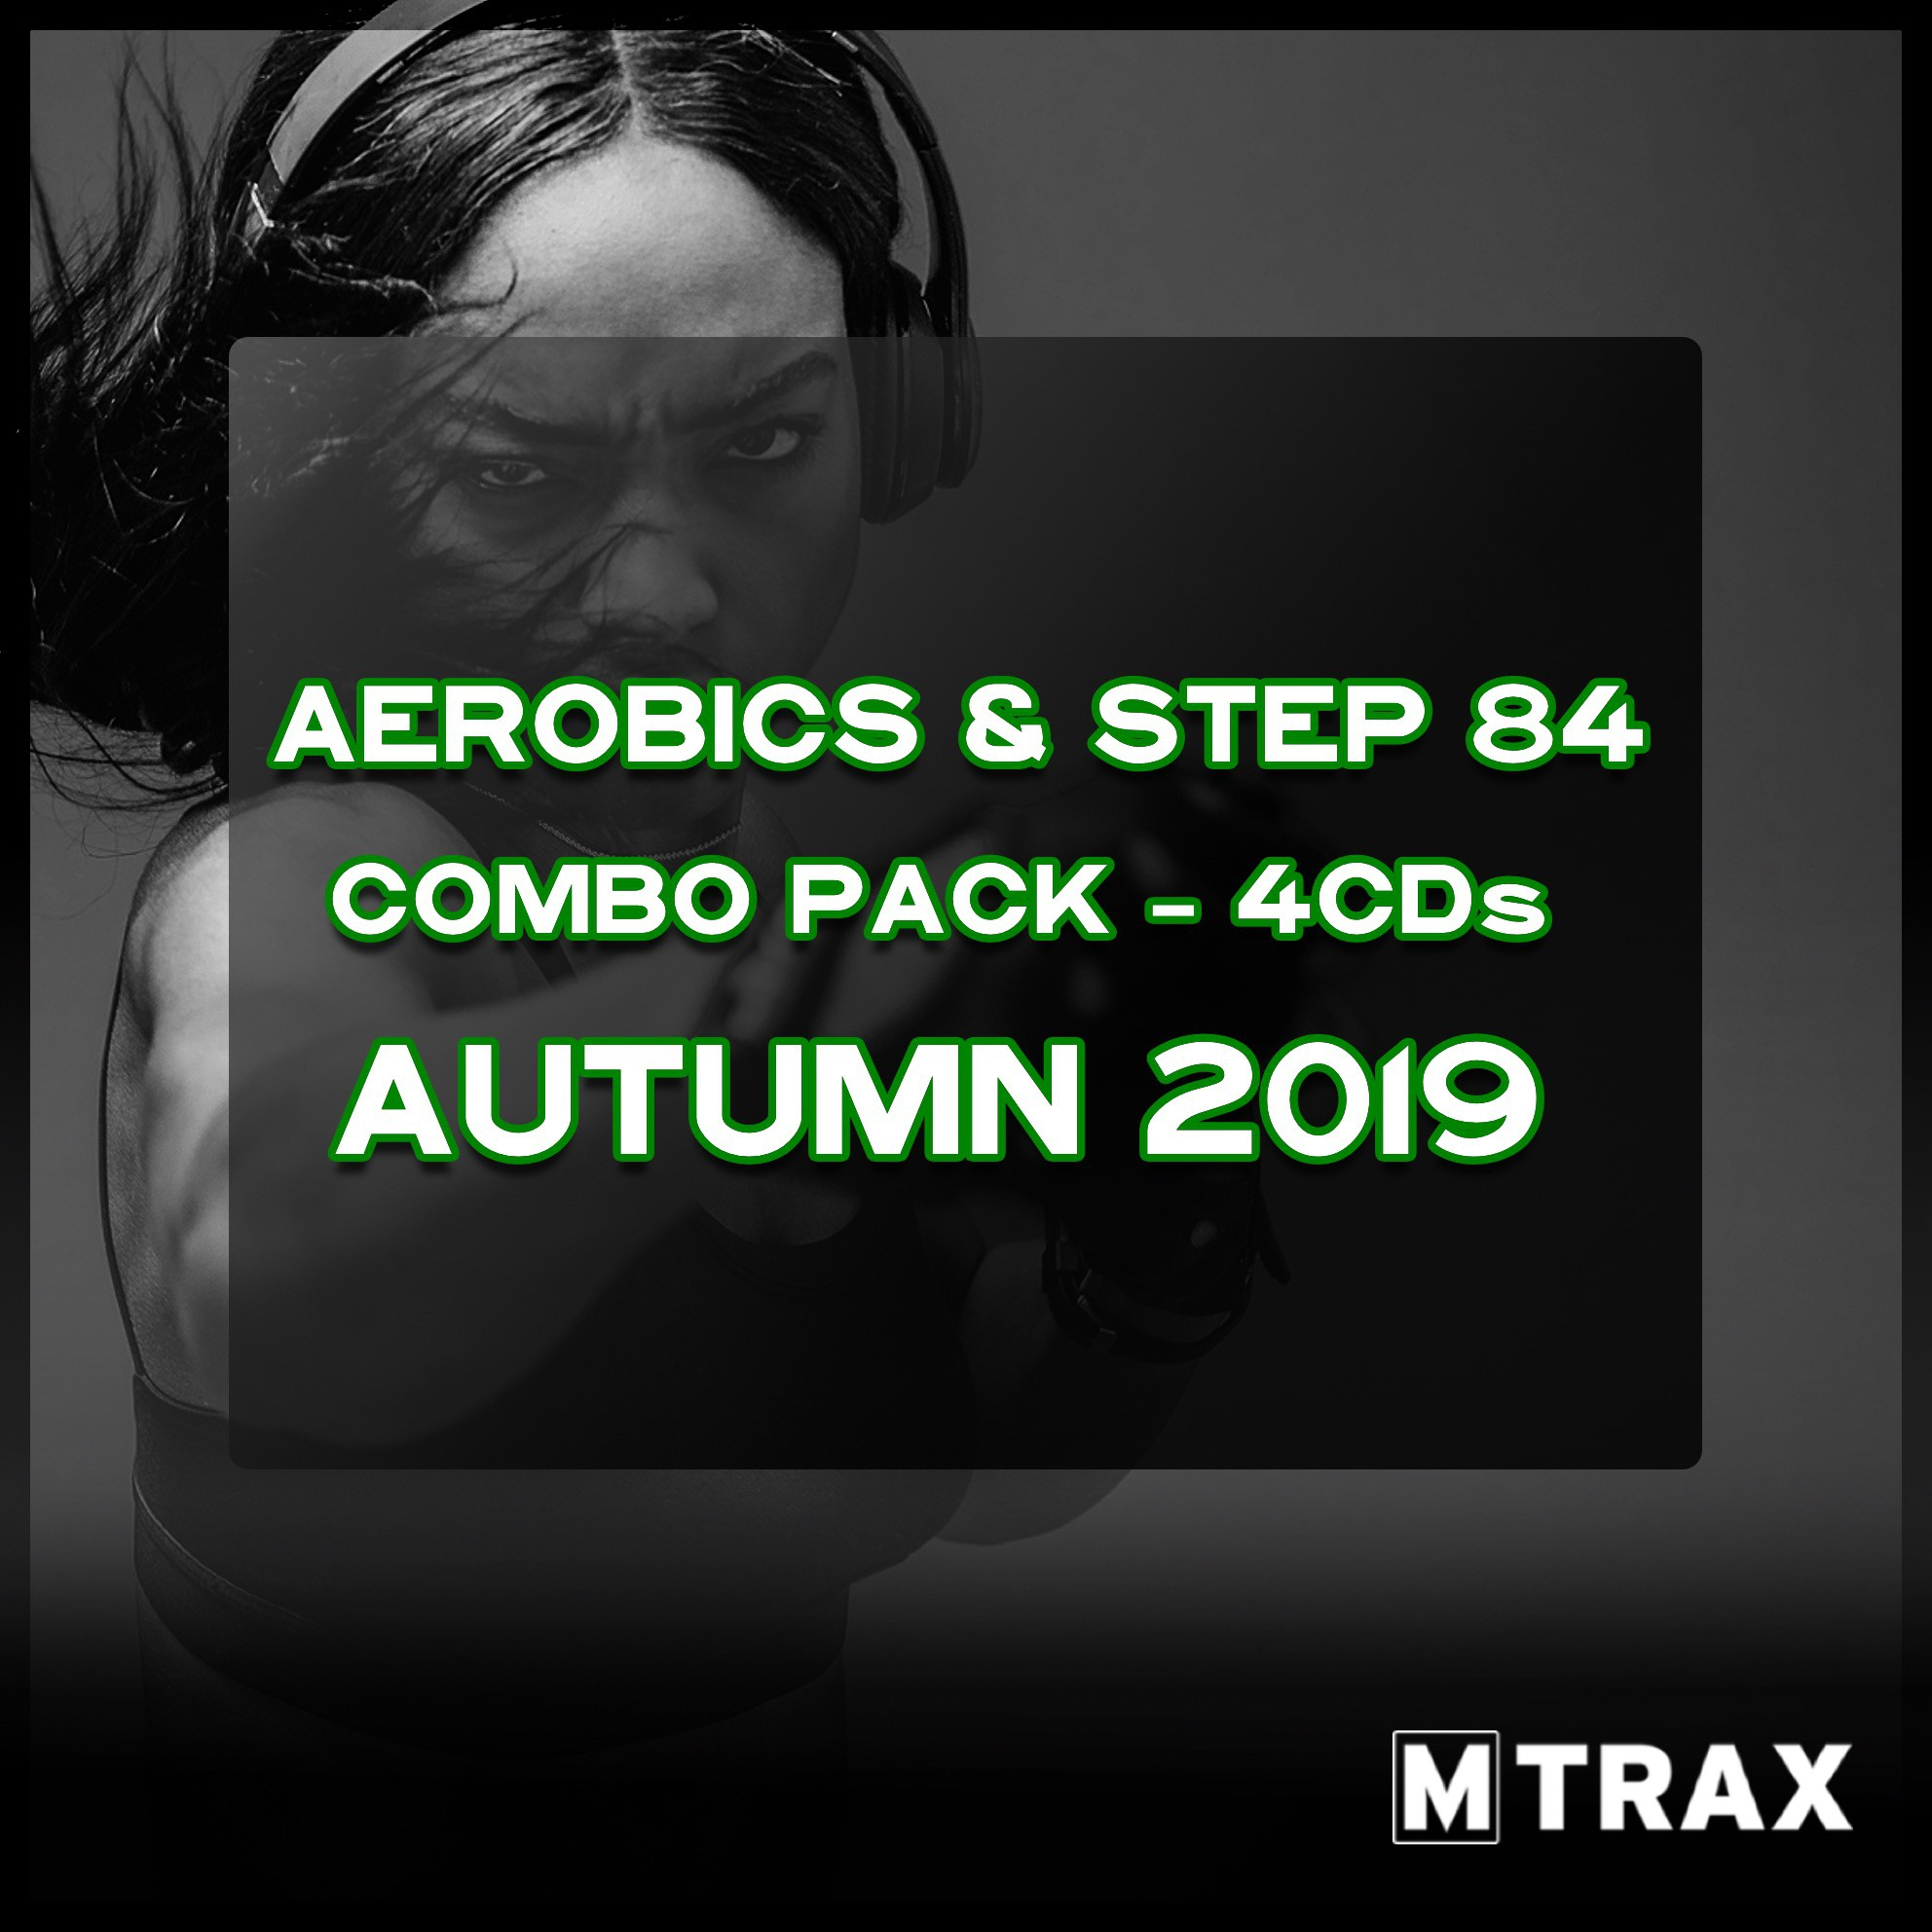 Aerobics & Step 84 Autumn 2019 Combo Pack (4CDs)